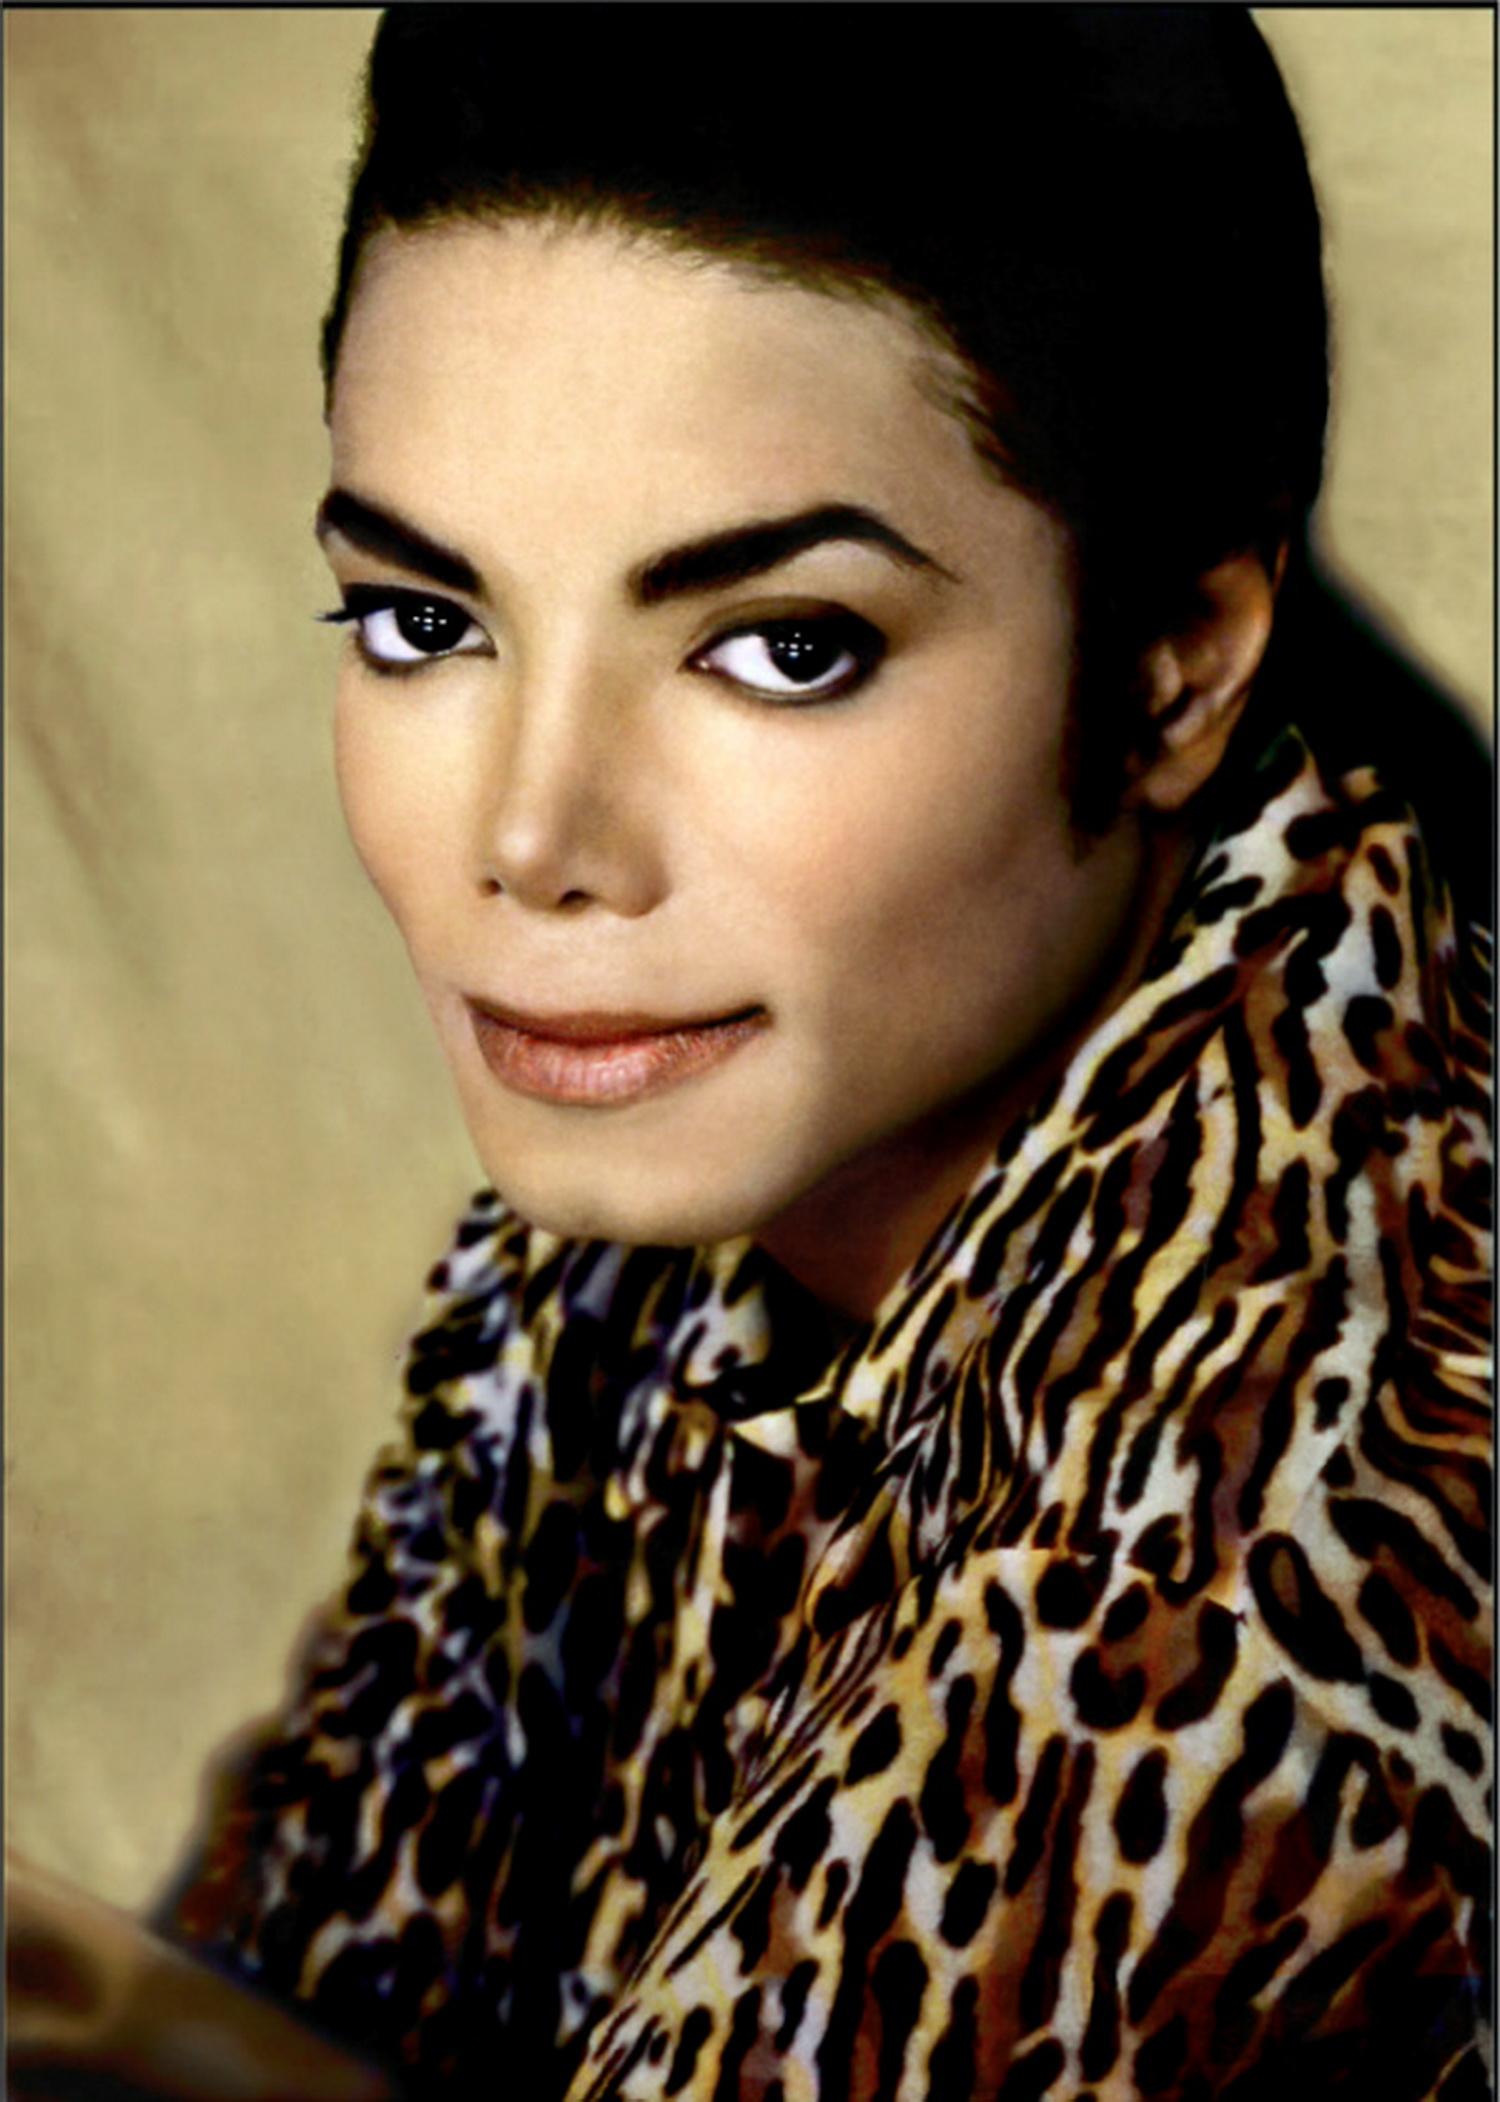 Raridades: Somente fotos RARAS de Michael Jackson. - Página 4 -michael-jackson-27079606-1500-2102